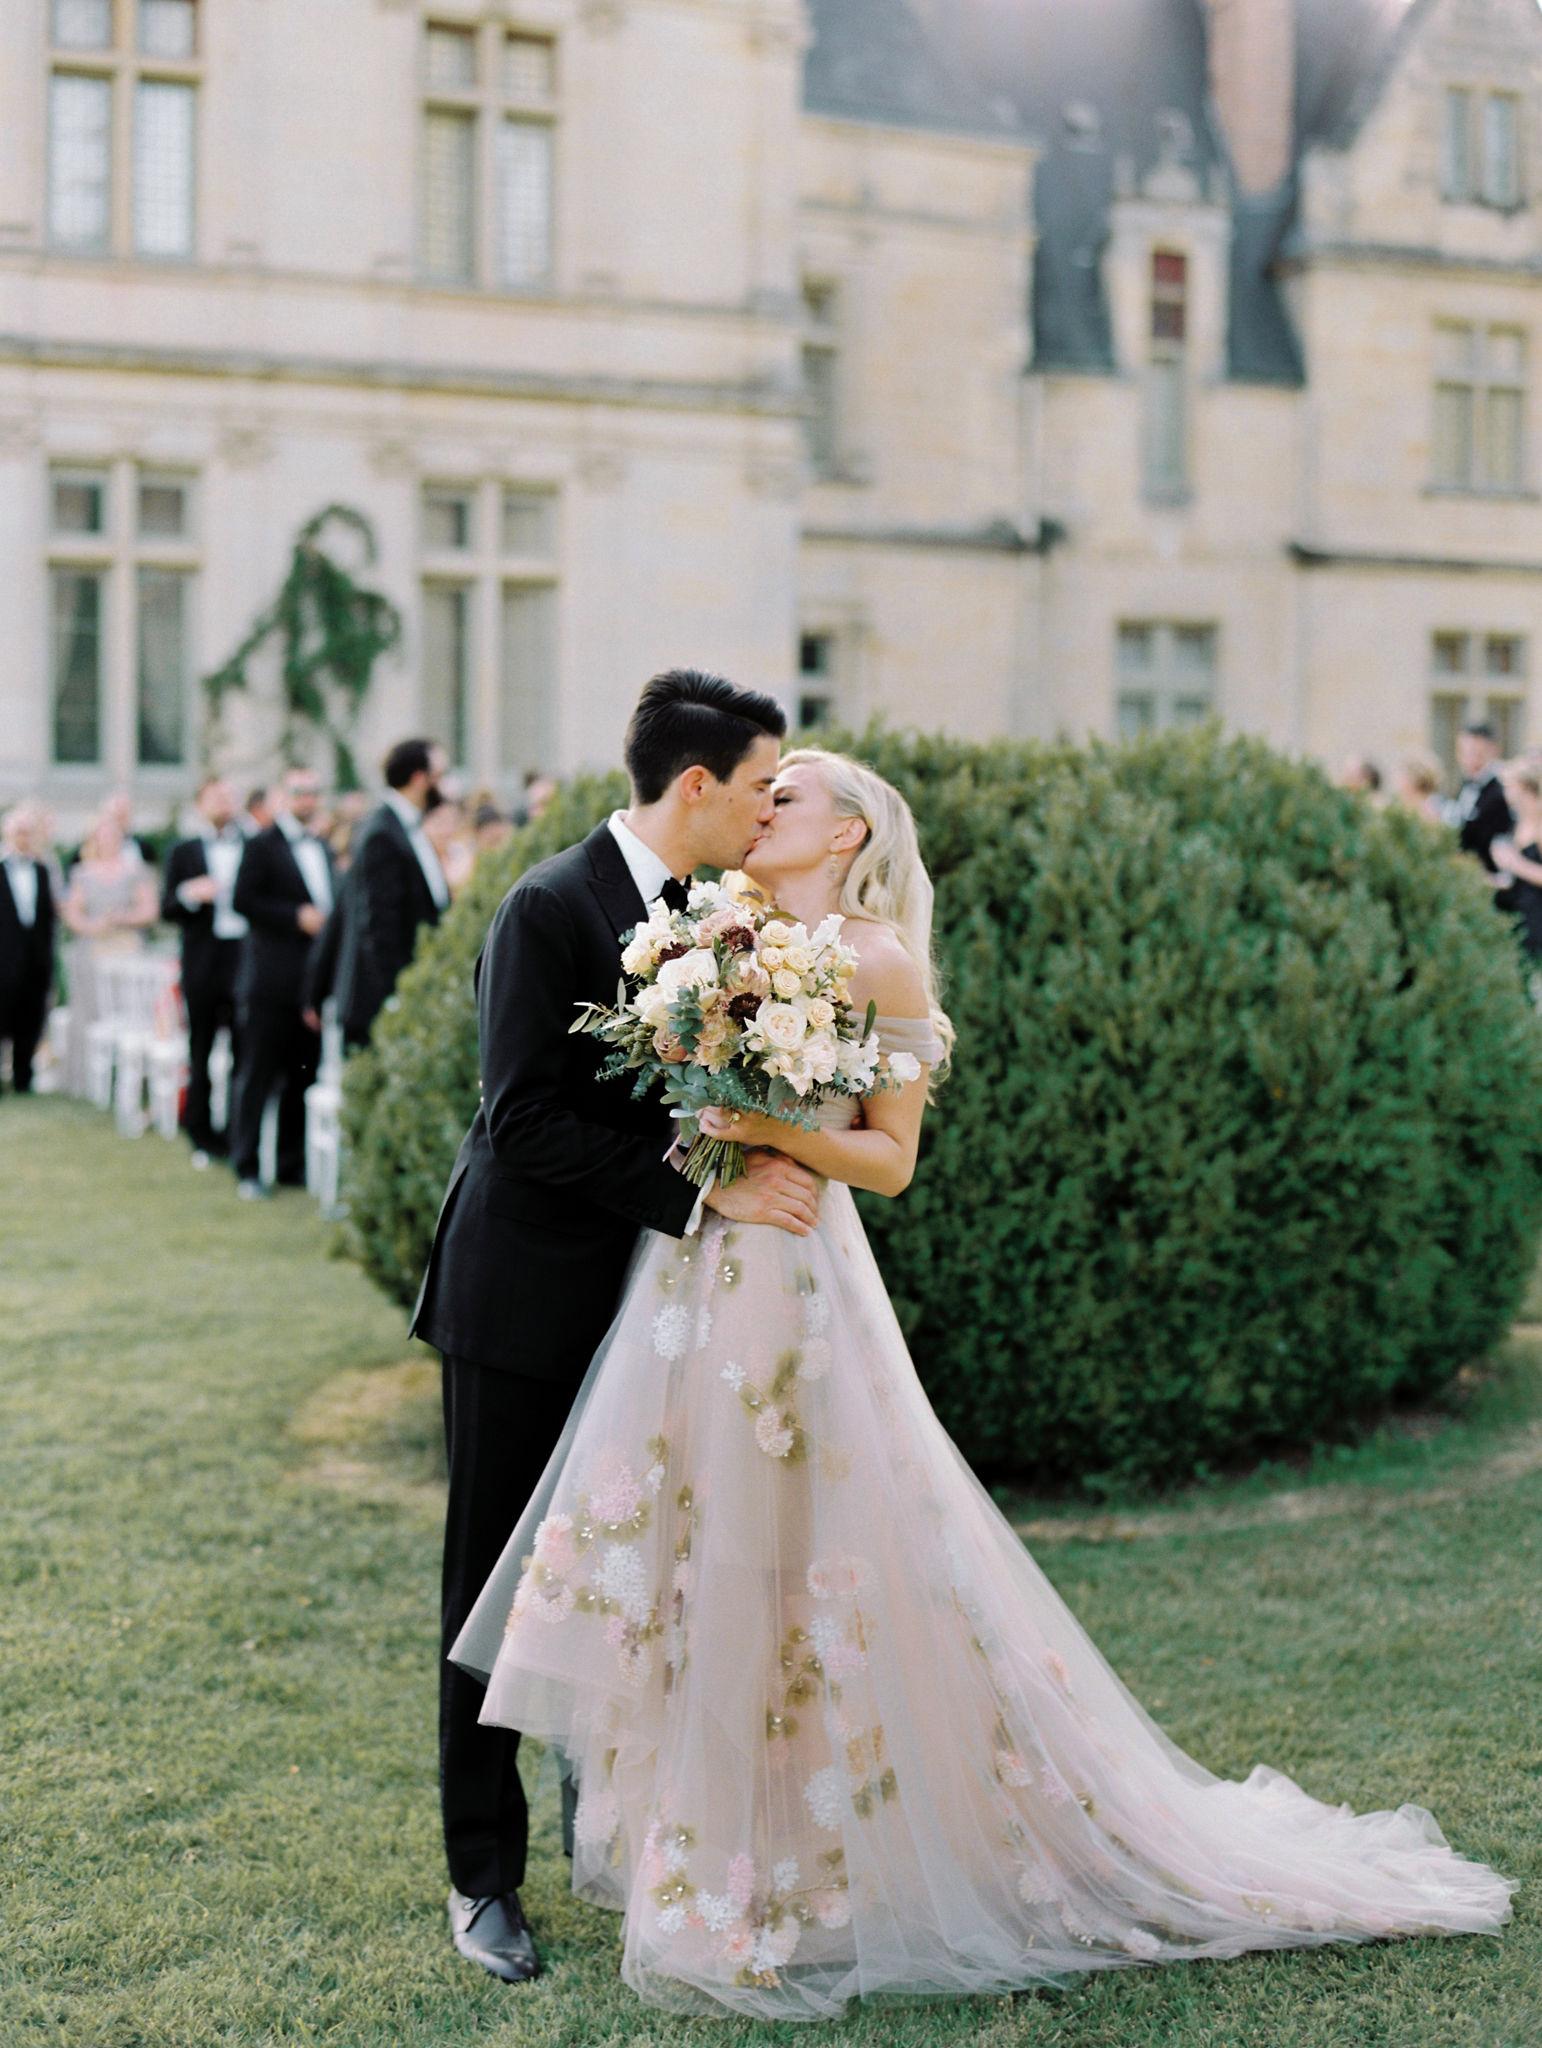 wedding recessional wedding couple kissing